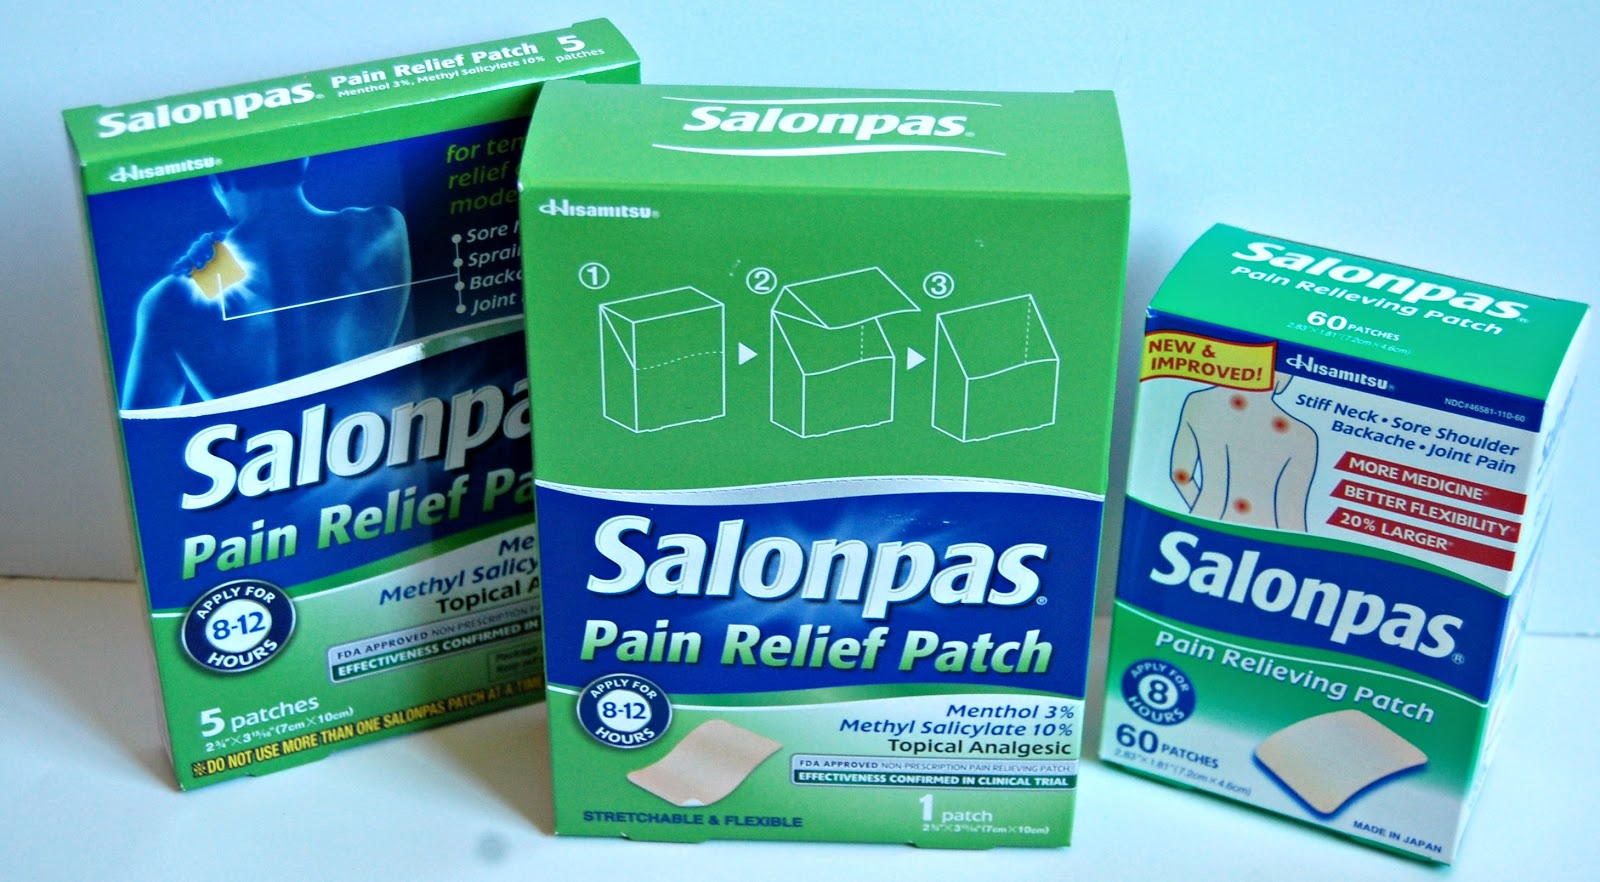 for Salonpas lidocaine 4